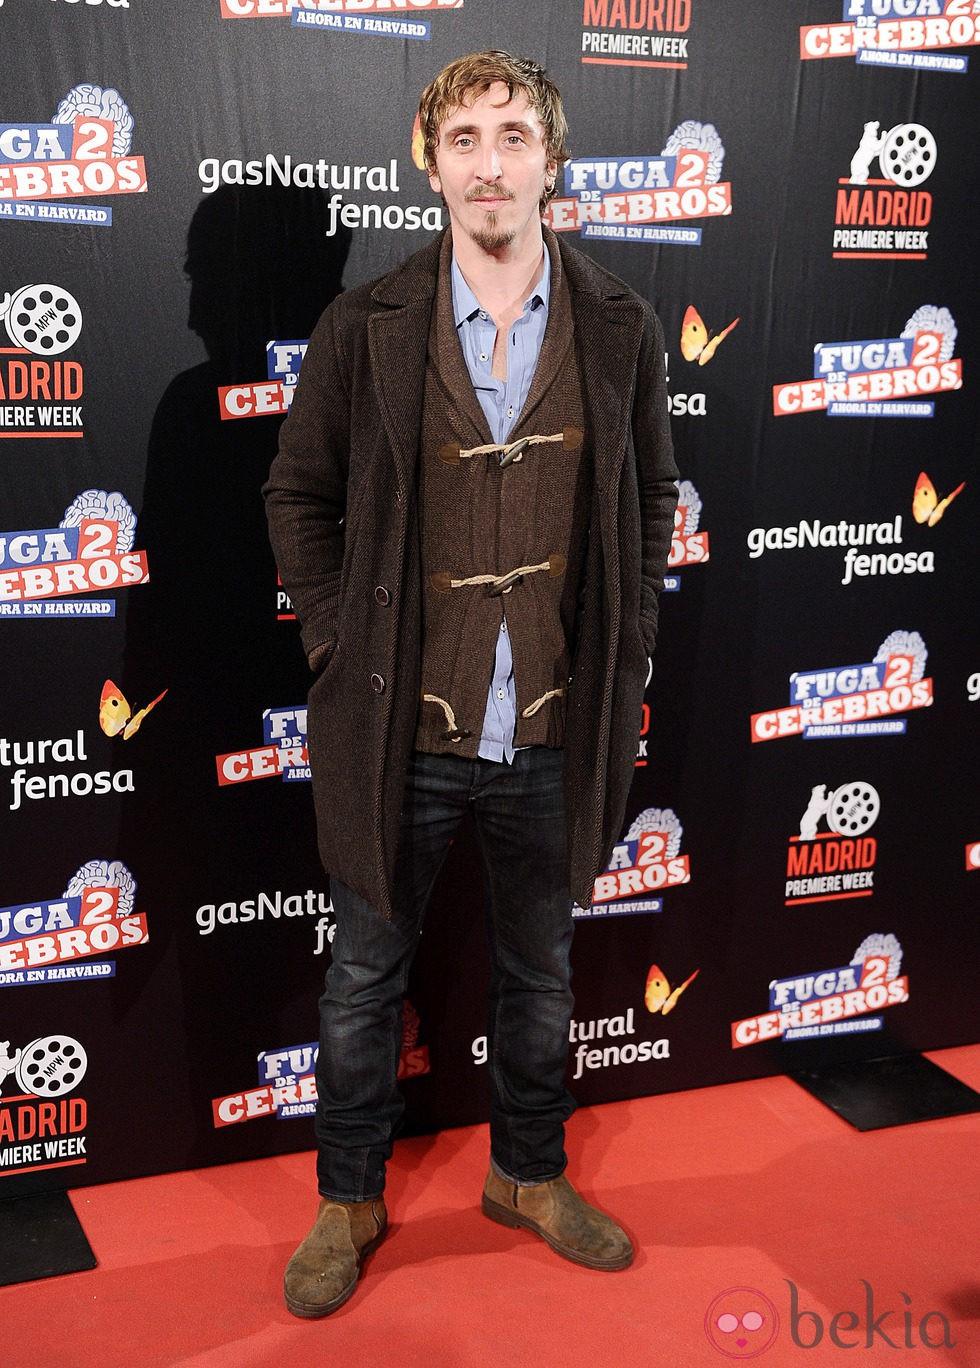 Iván Massague en el estreno de 'Fuga de cerebros 2' en la 'Madrid Premiere Week'